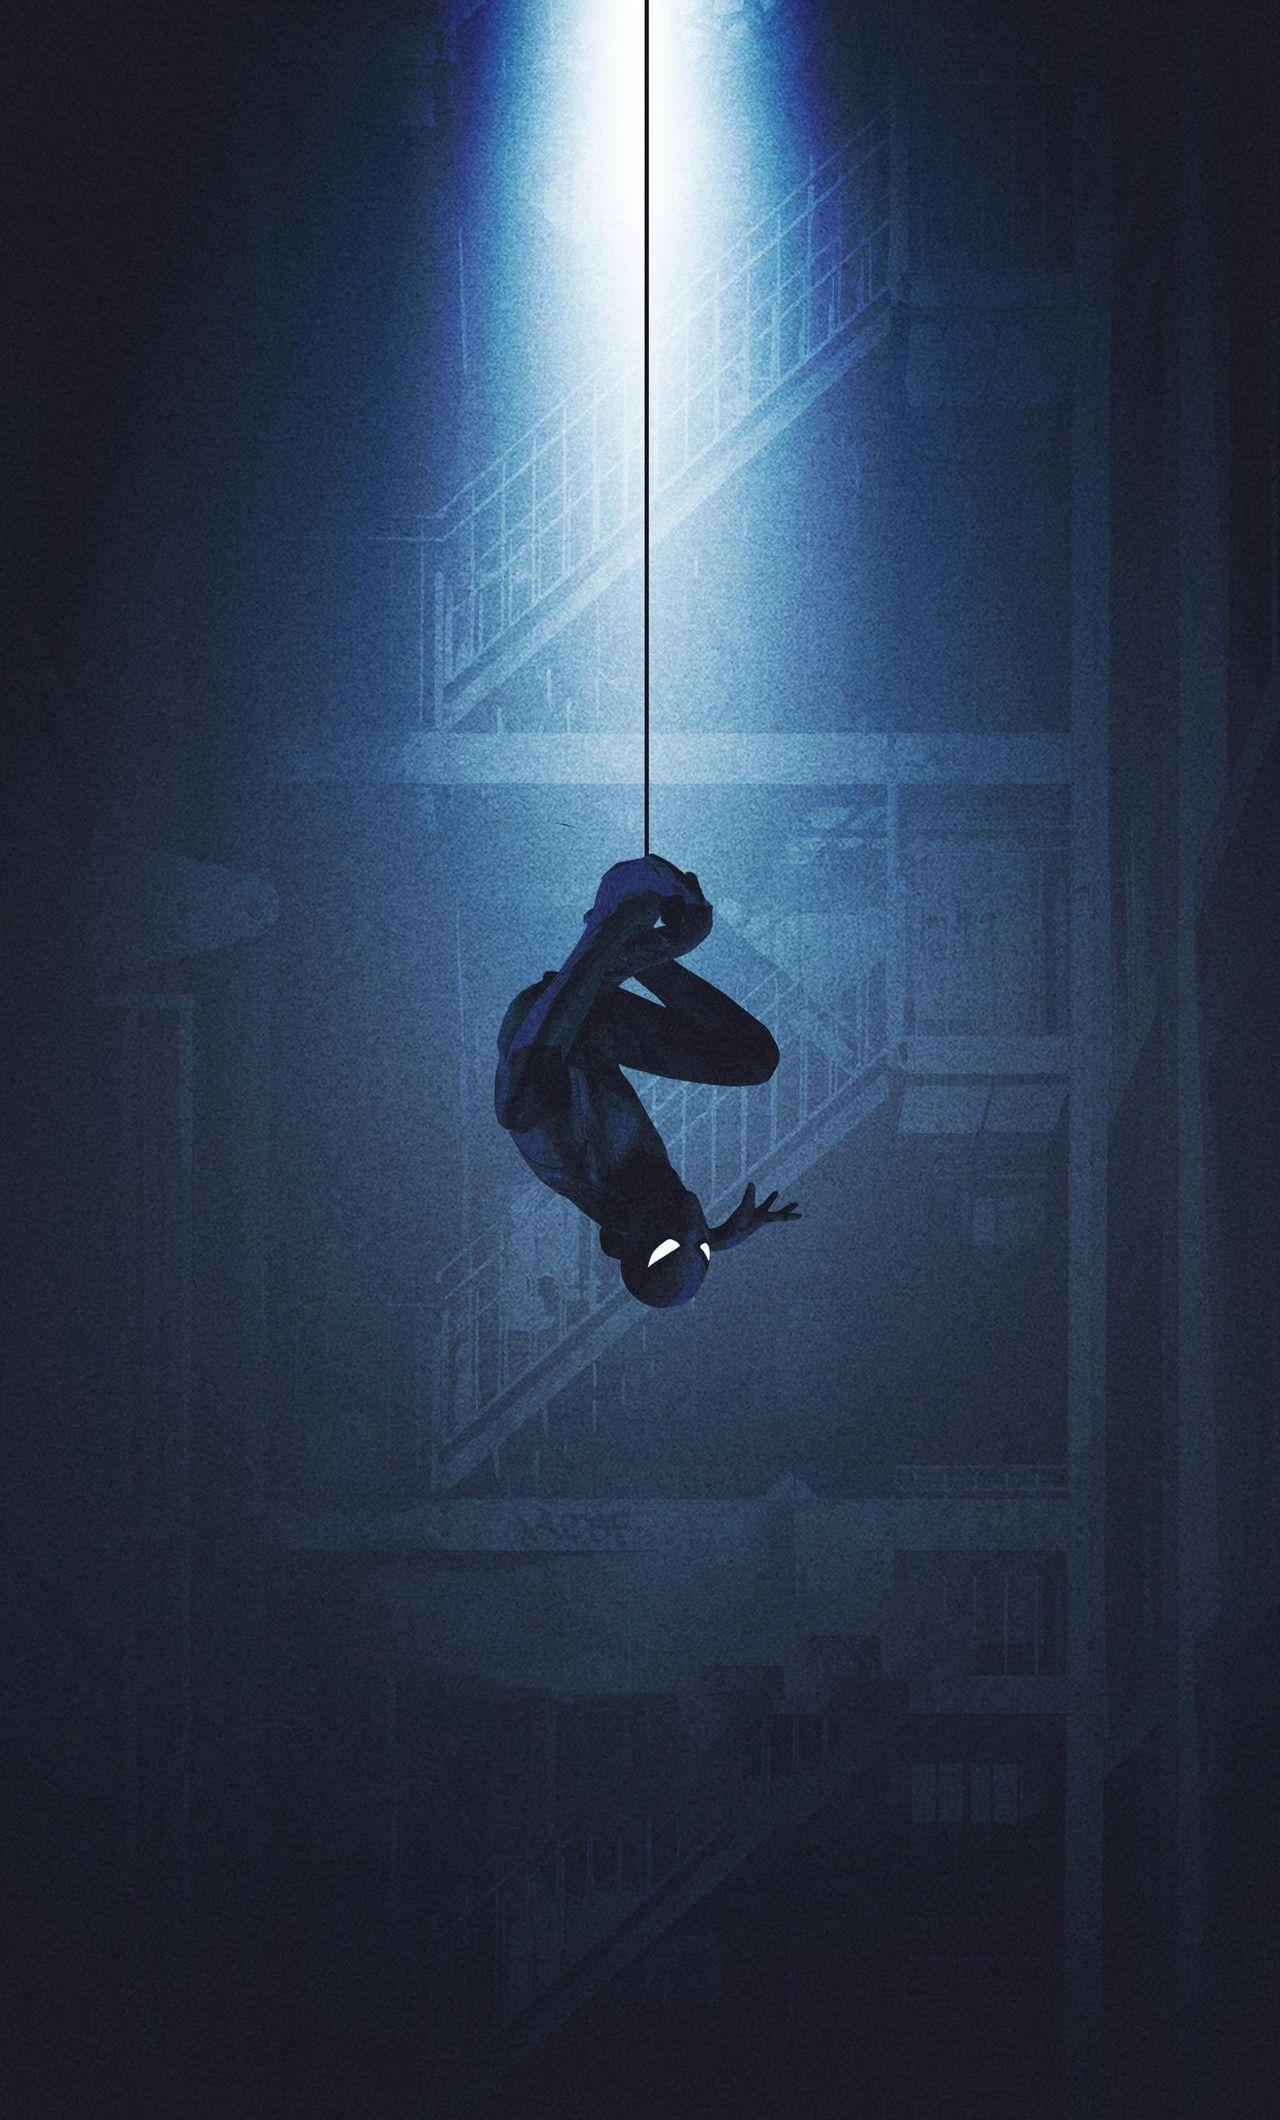 Black Spider Man Iphone Wallpapers Top Free Black Spider